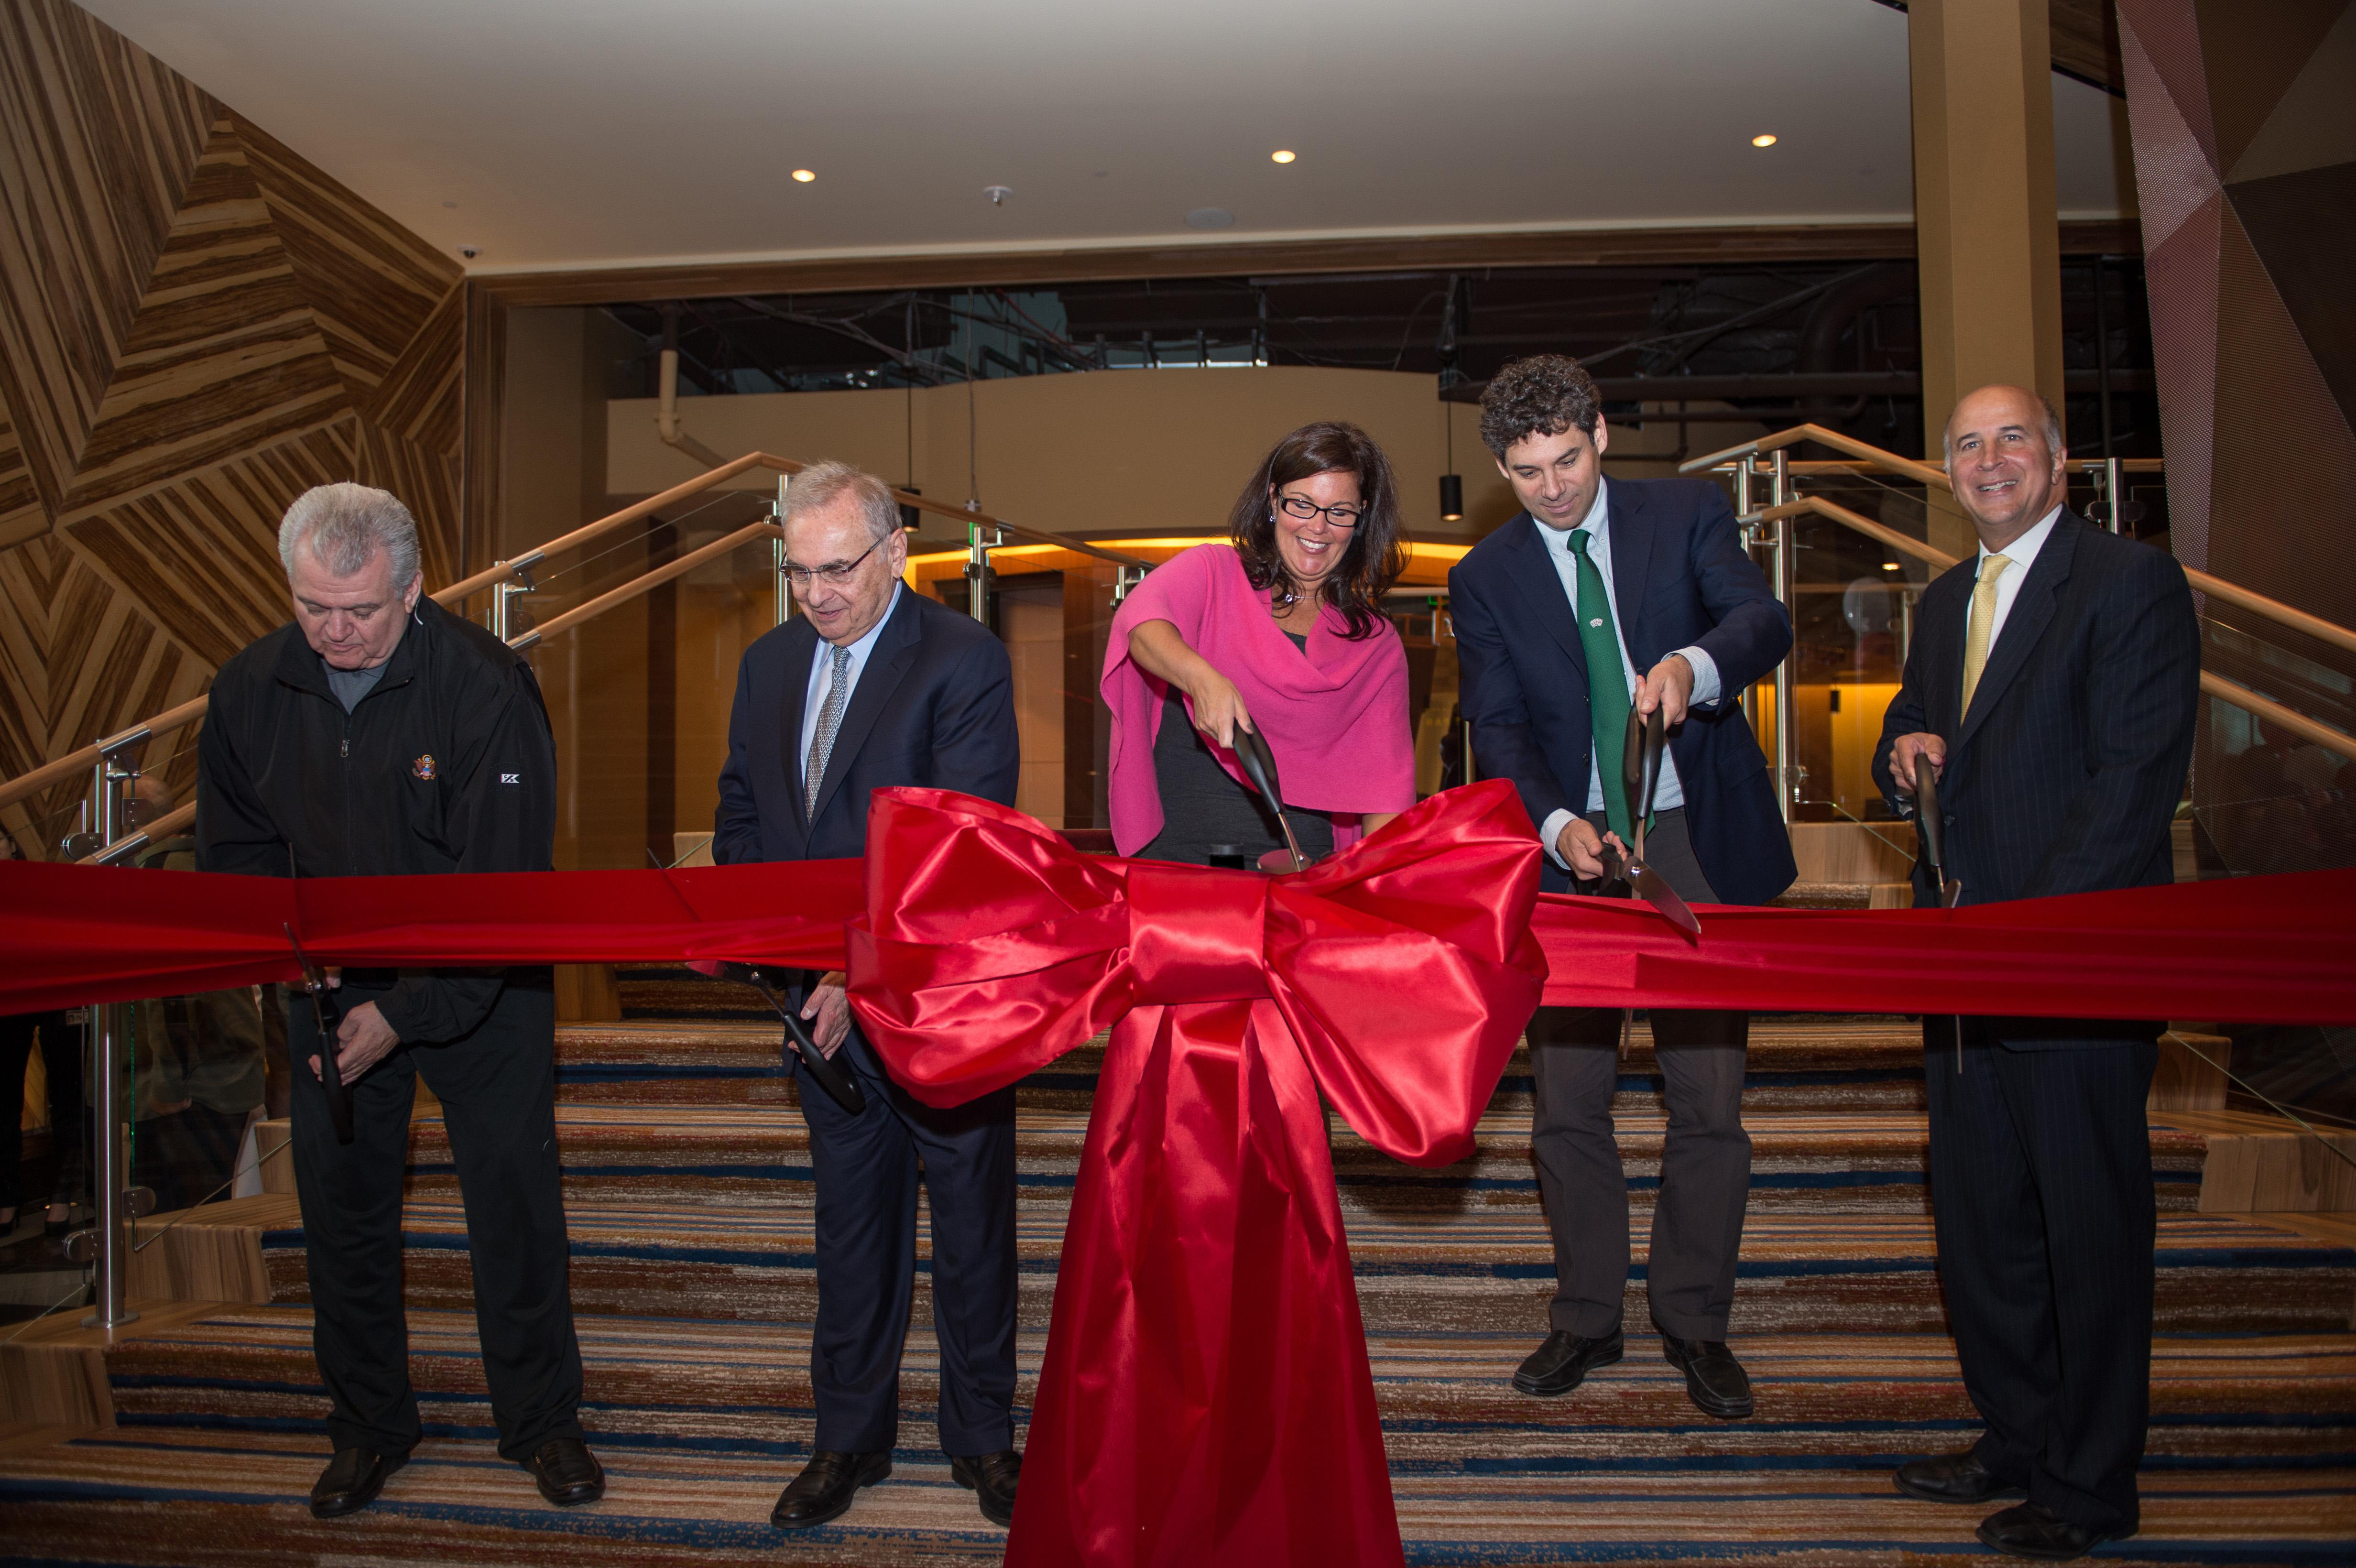 SugarHouse Casino Cuts Ribbon on $164 Million Expansion | Business